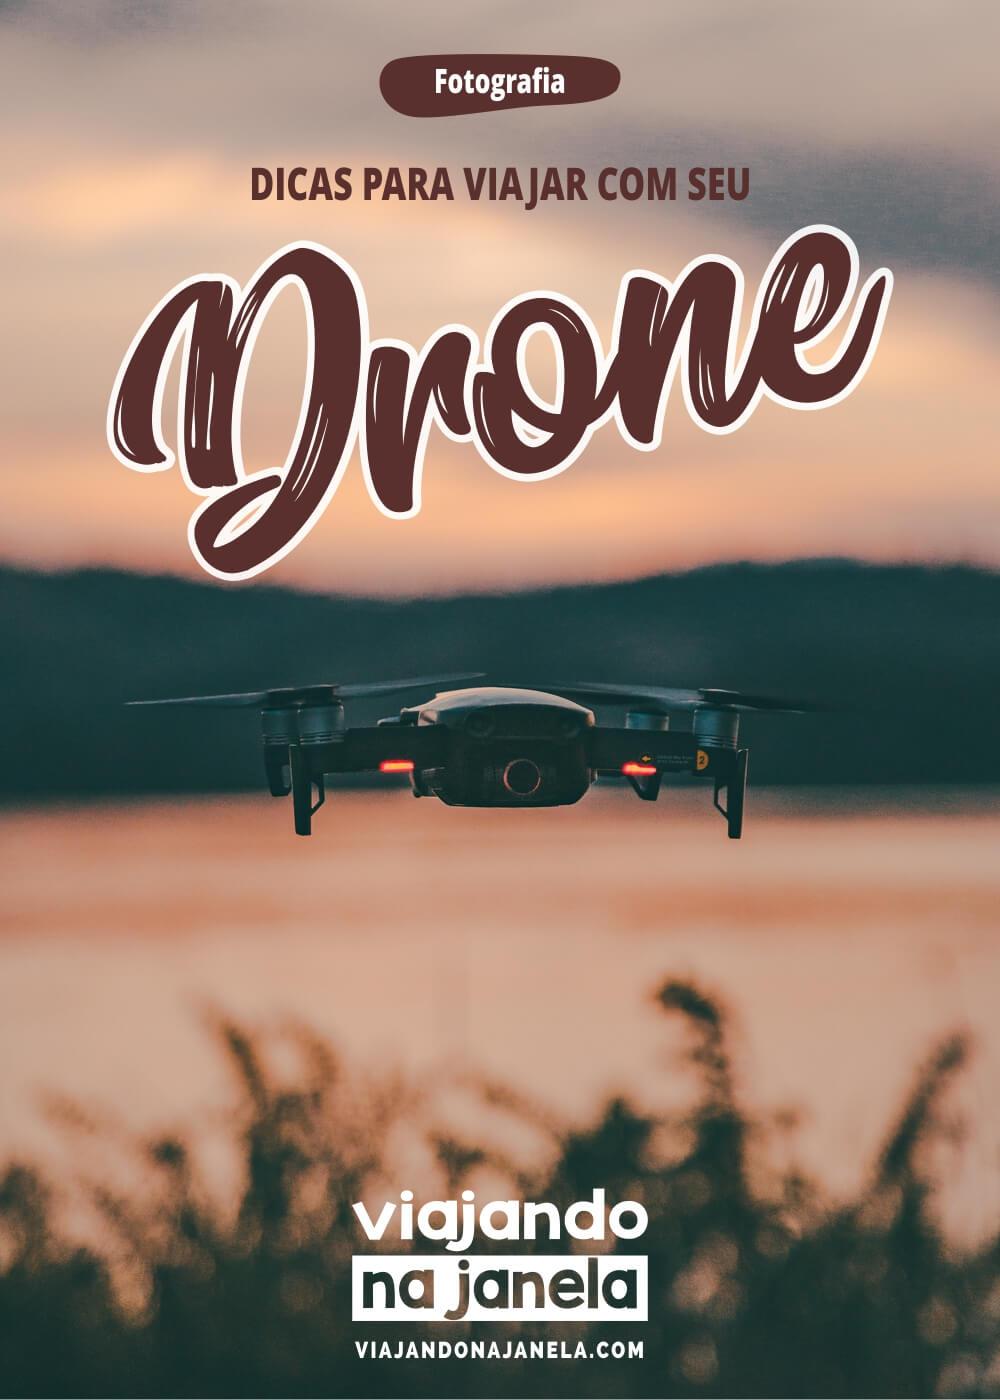 Drone para viajar: dicas